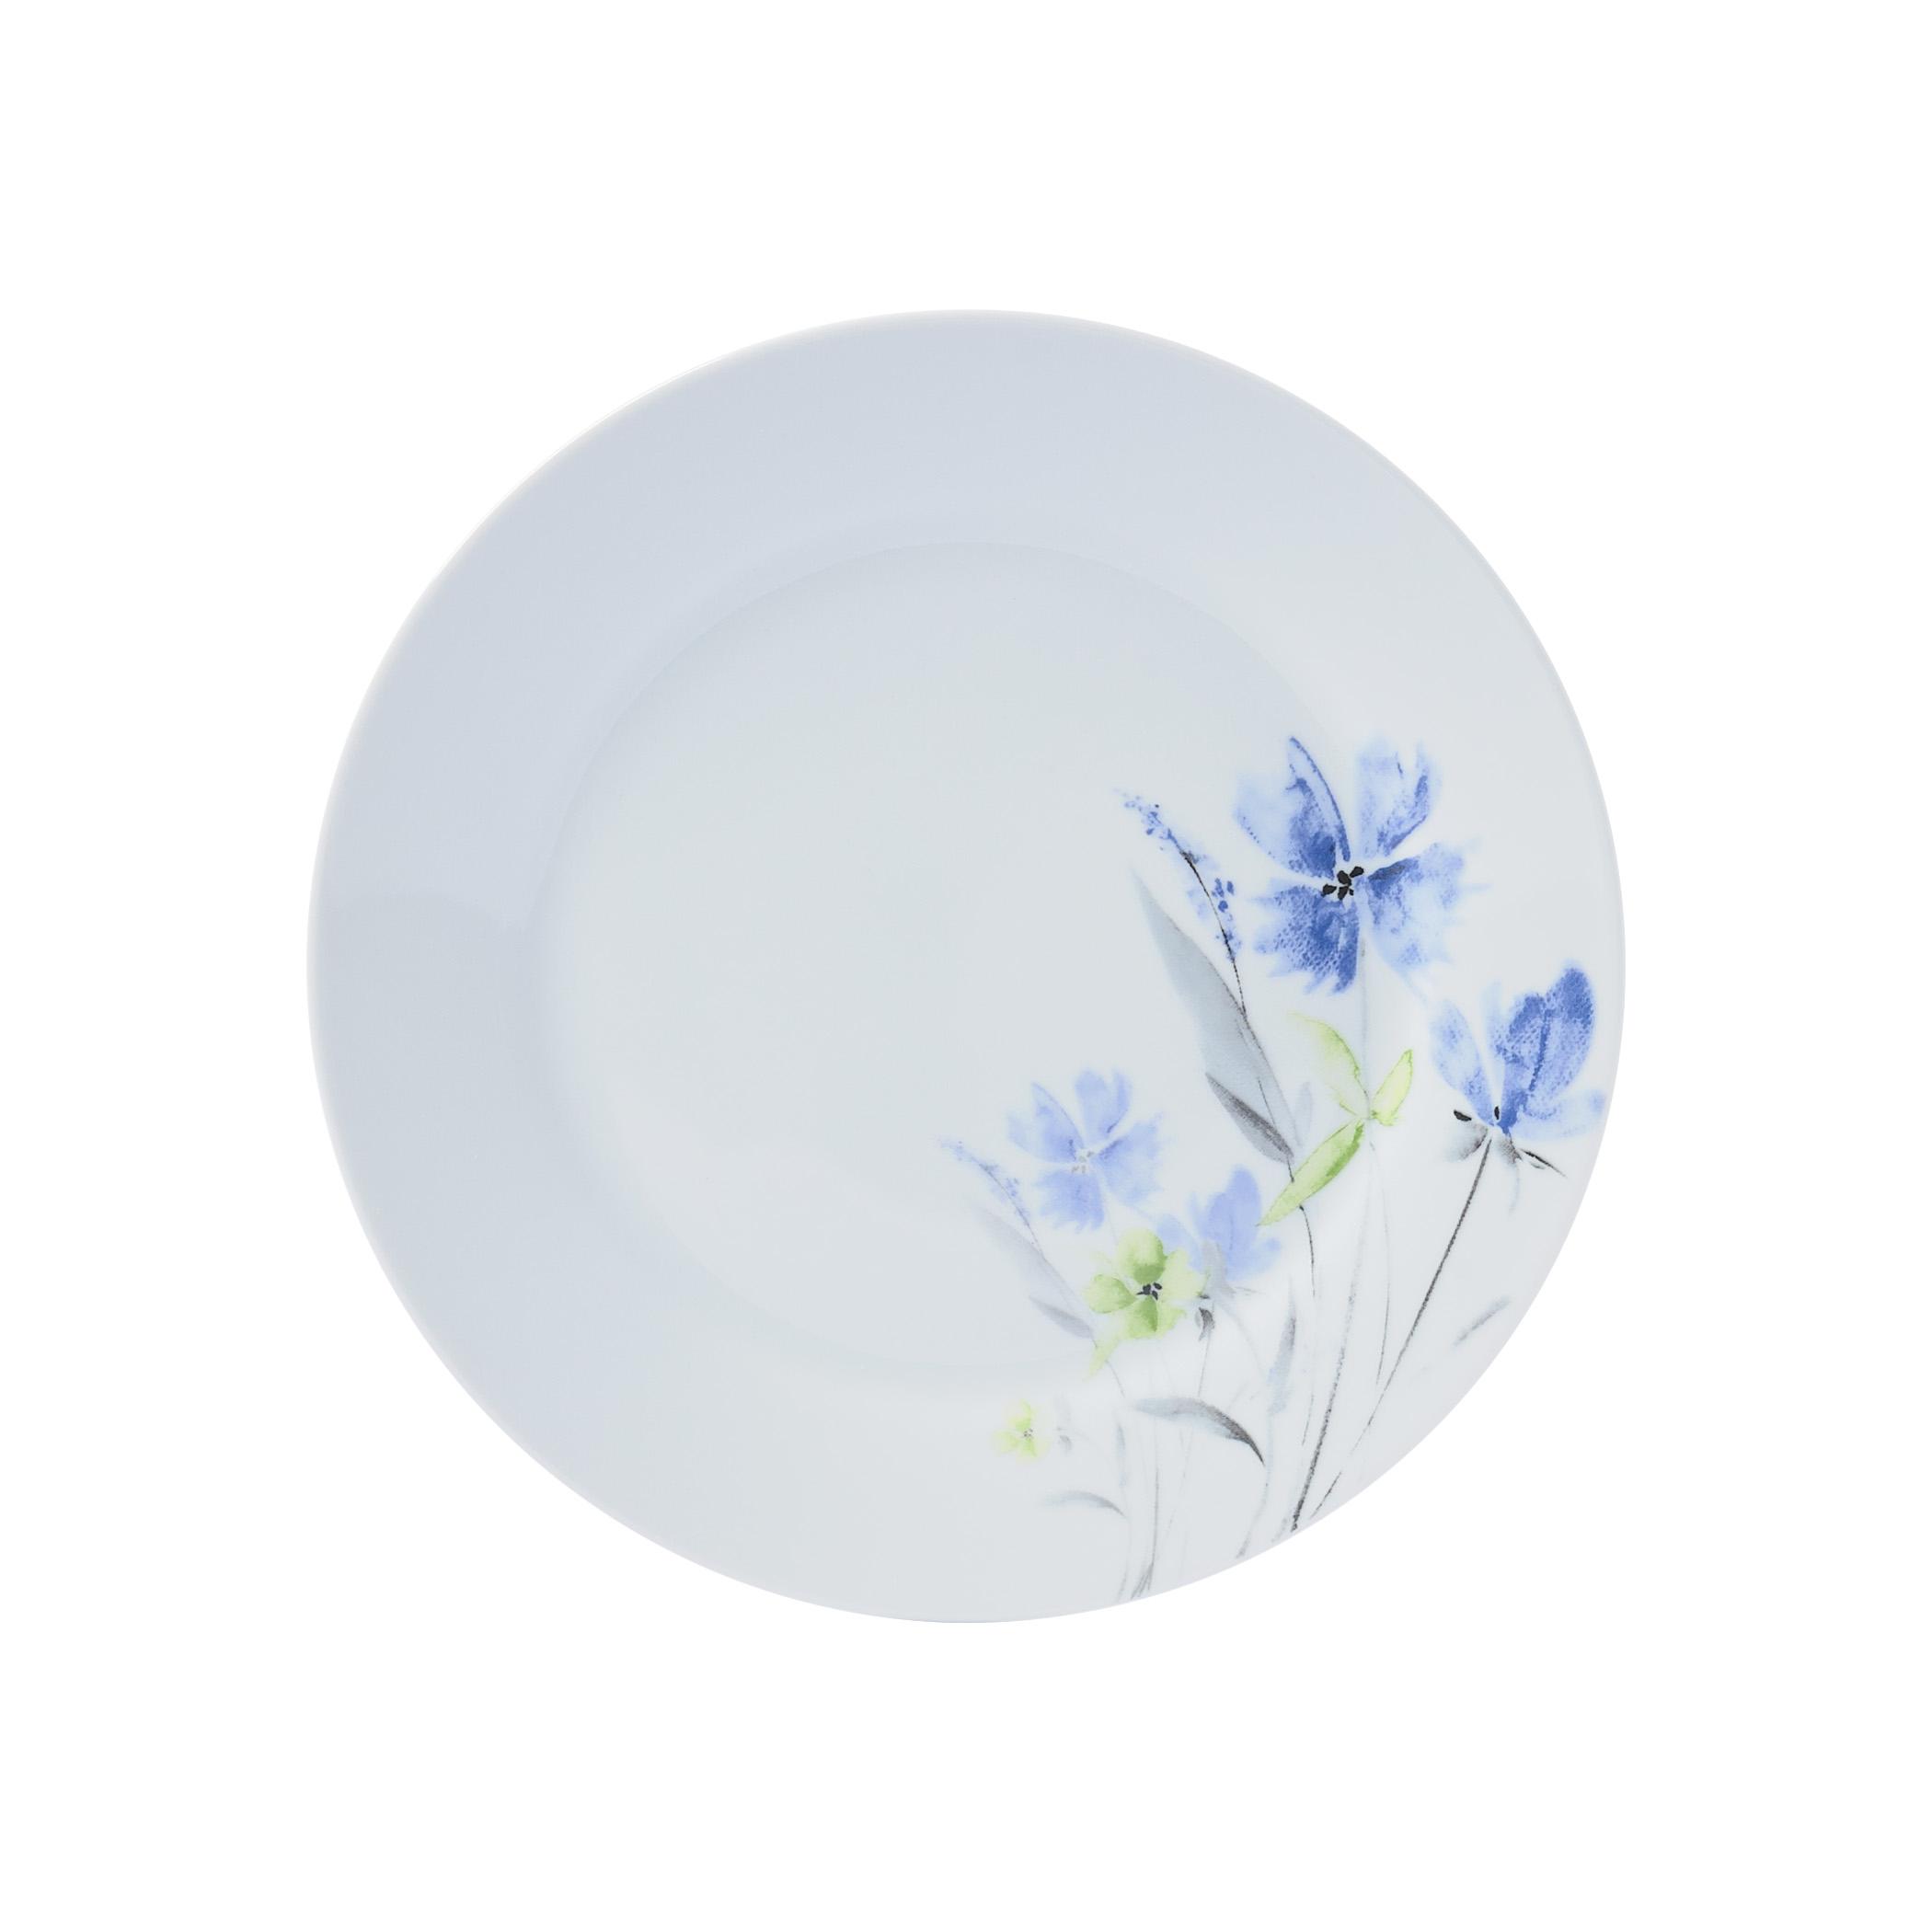 16 Piece Porcelain Dinnerware Set by Tabletops Gallery  TTU